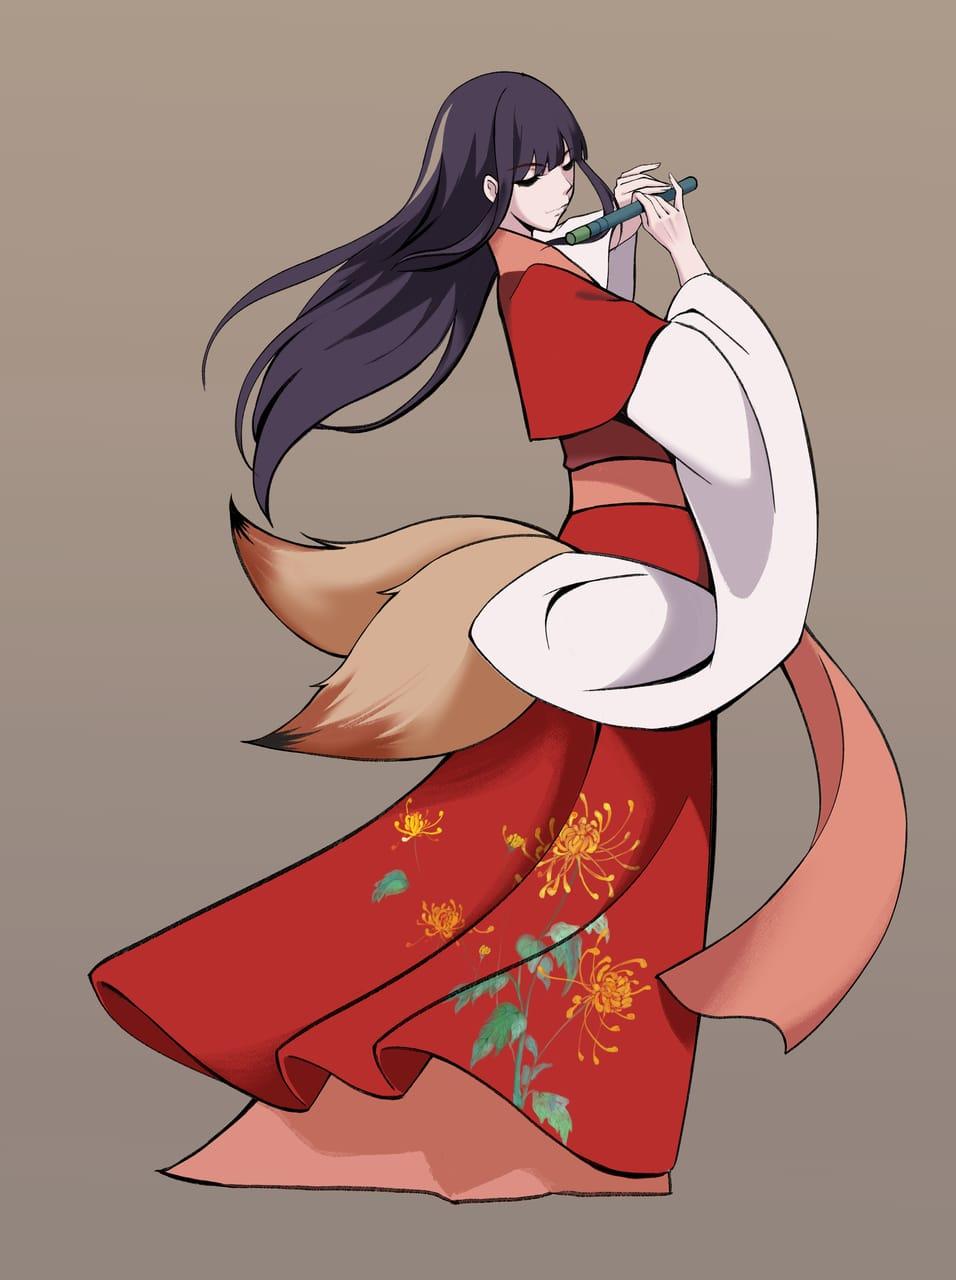 狐妖 Illust of 星期音二 January2021_Contest:OC girl 一次创作 original